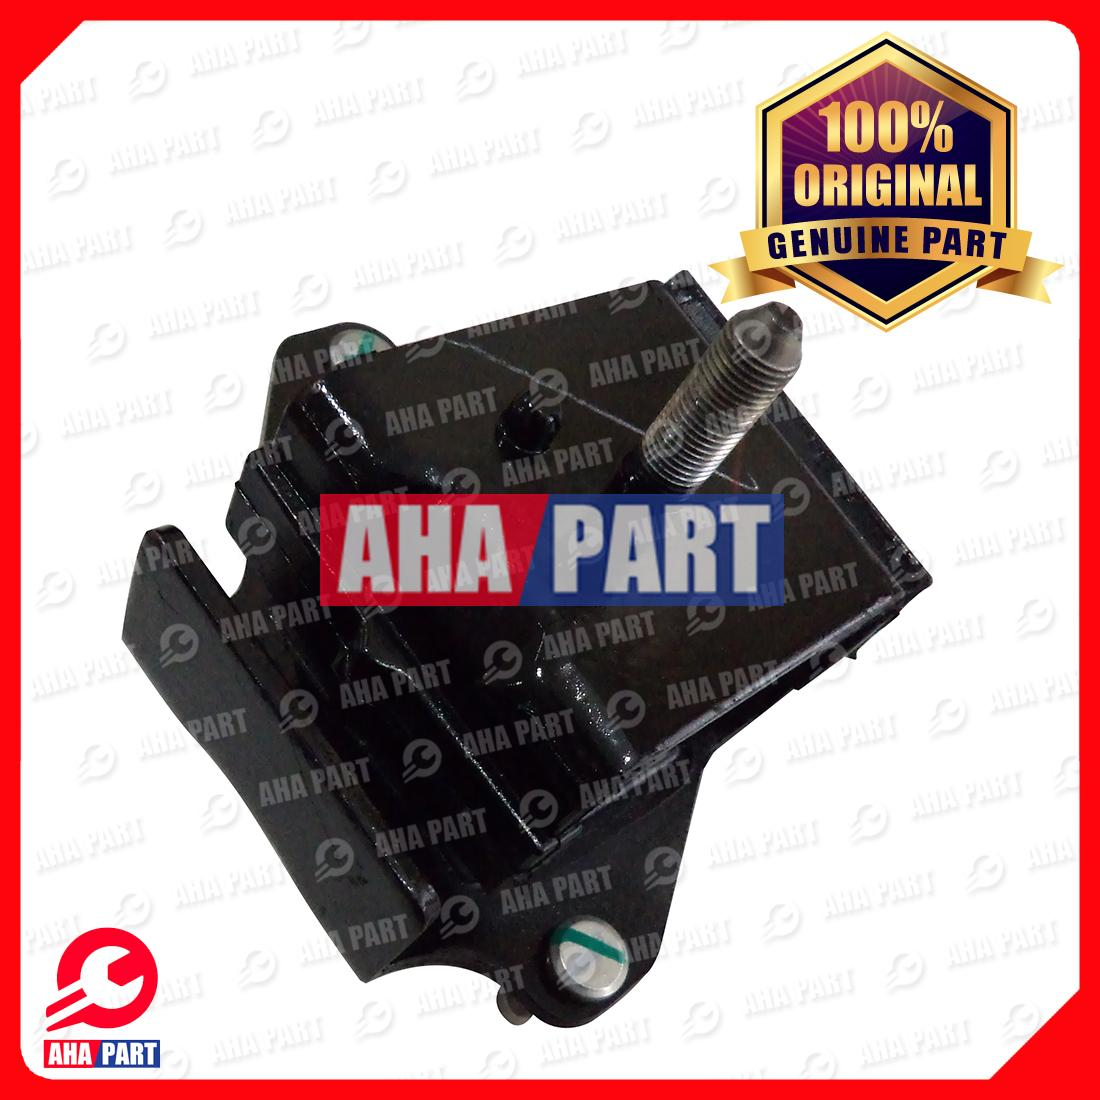 Kelebihan Daihatsu Head Lamp Headlamp Kiri Ayla Agya 81170 Bz170 001 Granmax Engine Mounting Depan Gran Max Part No 12362